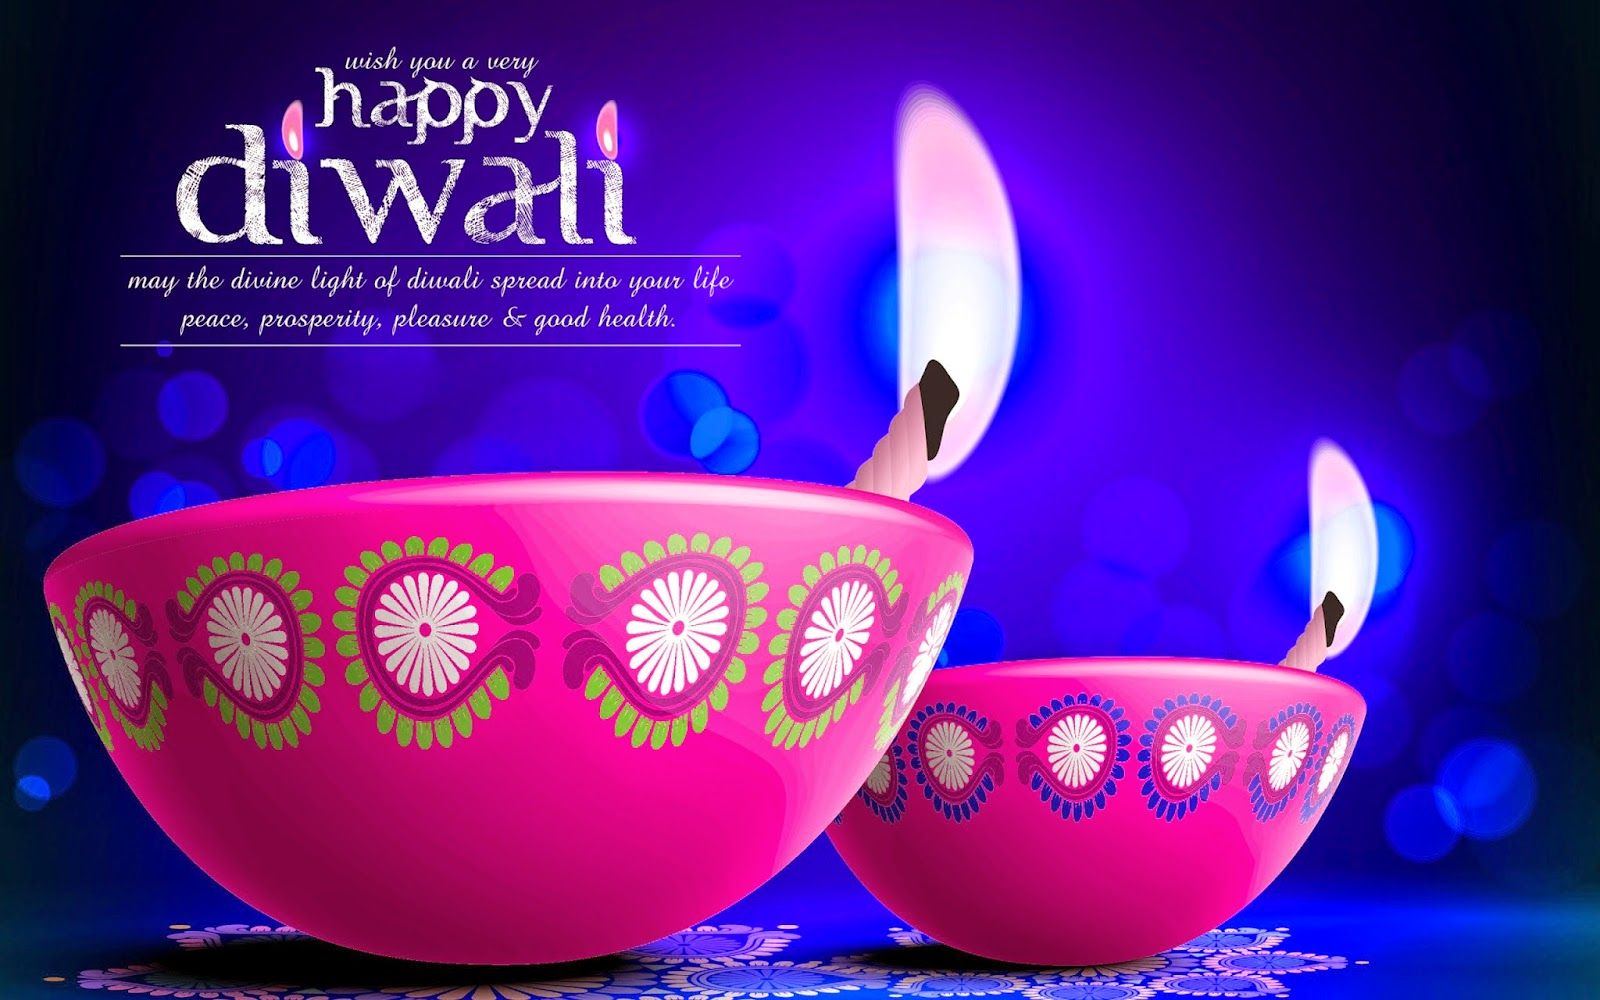 Happy Diwali Greetings 2015 Httphappydiwali2uhappy